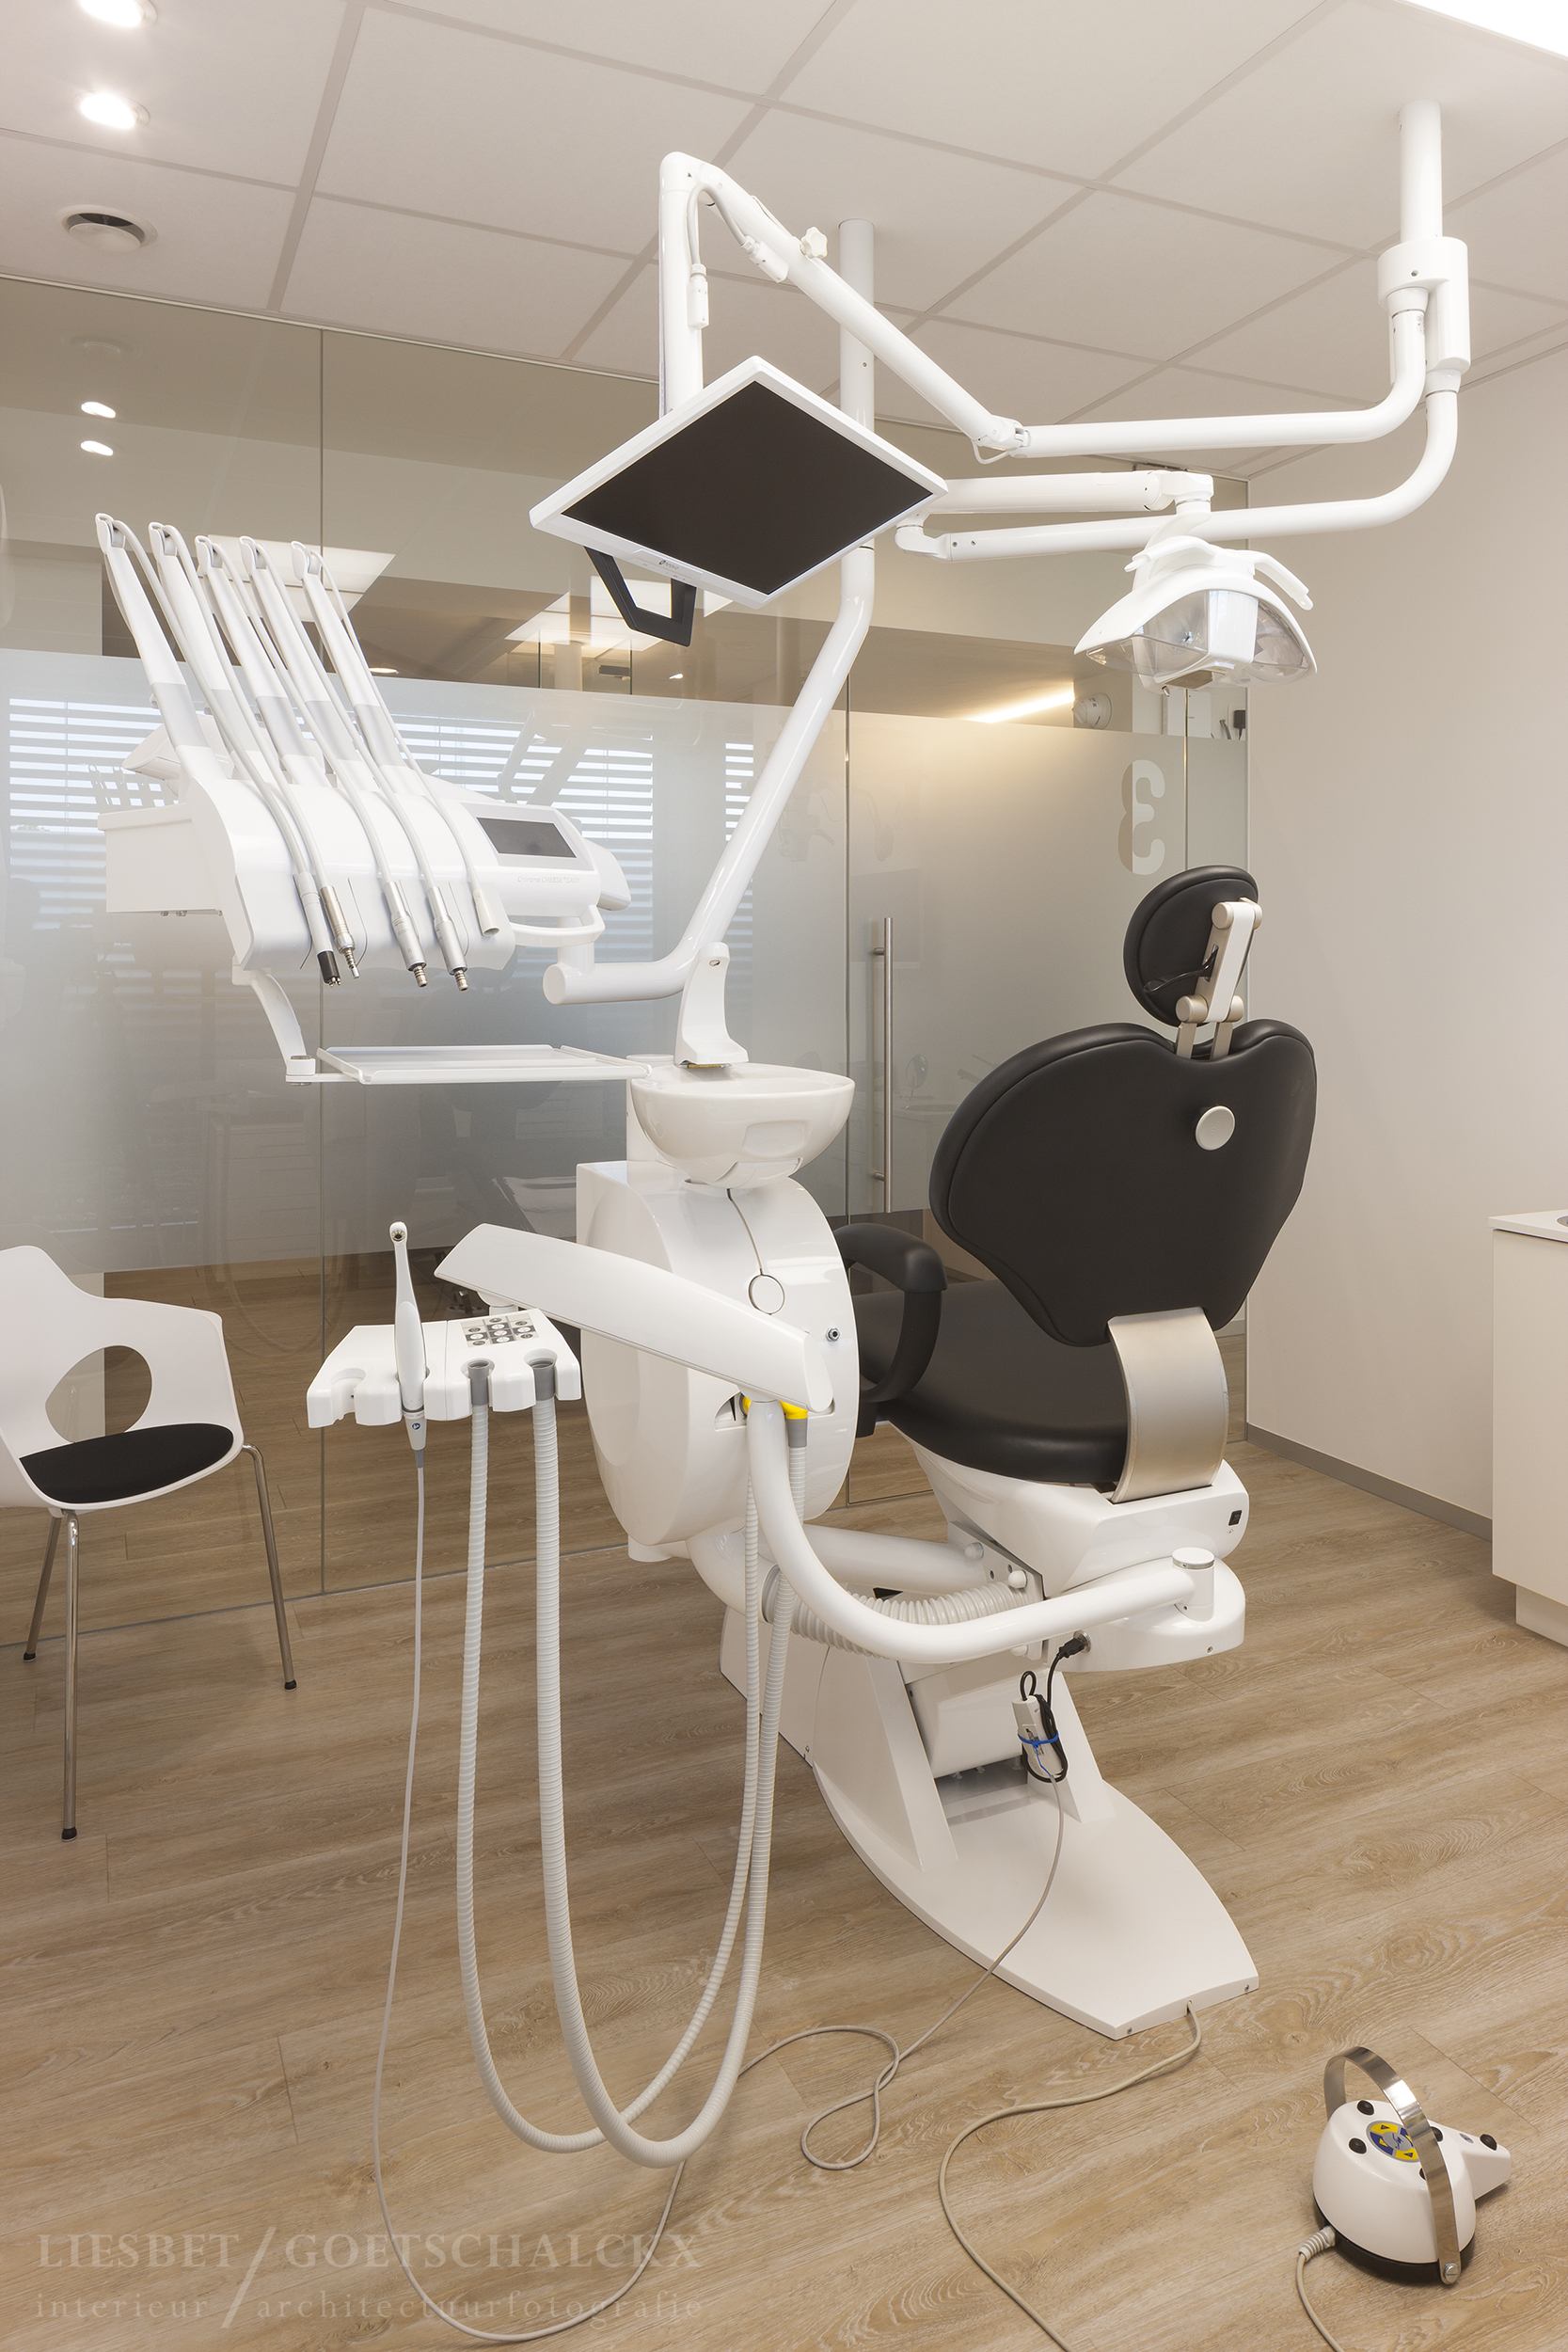 LG-Beneens-tandartspraktijkBosuil-Deurne_72dpi_watermerk-9.jpg